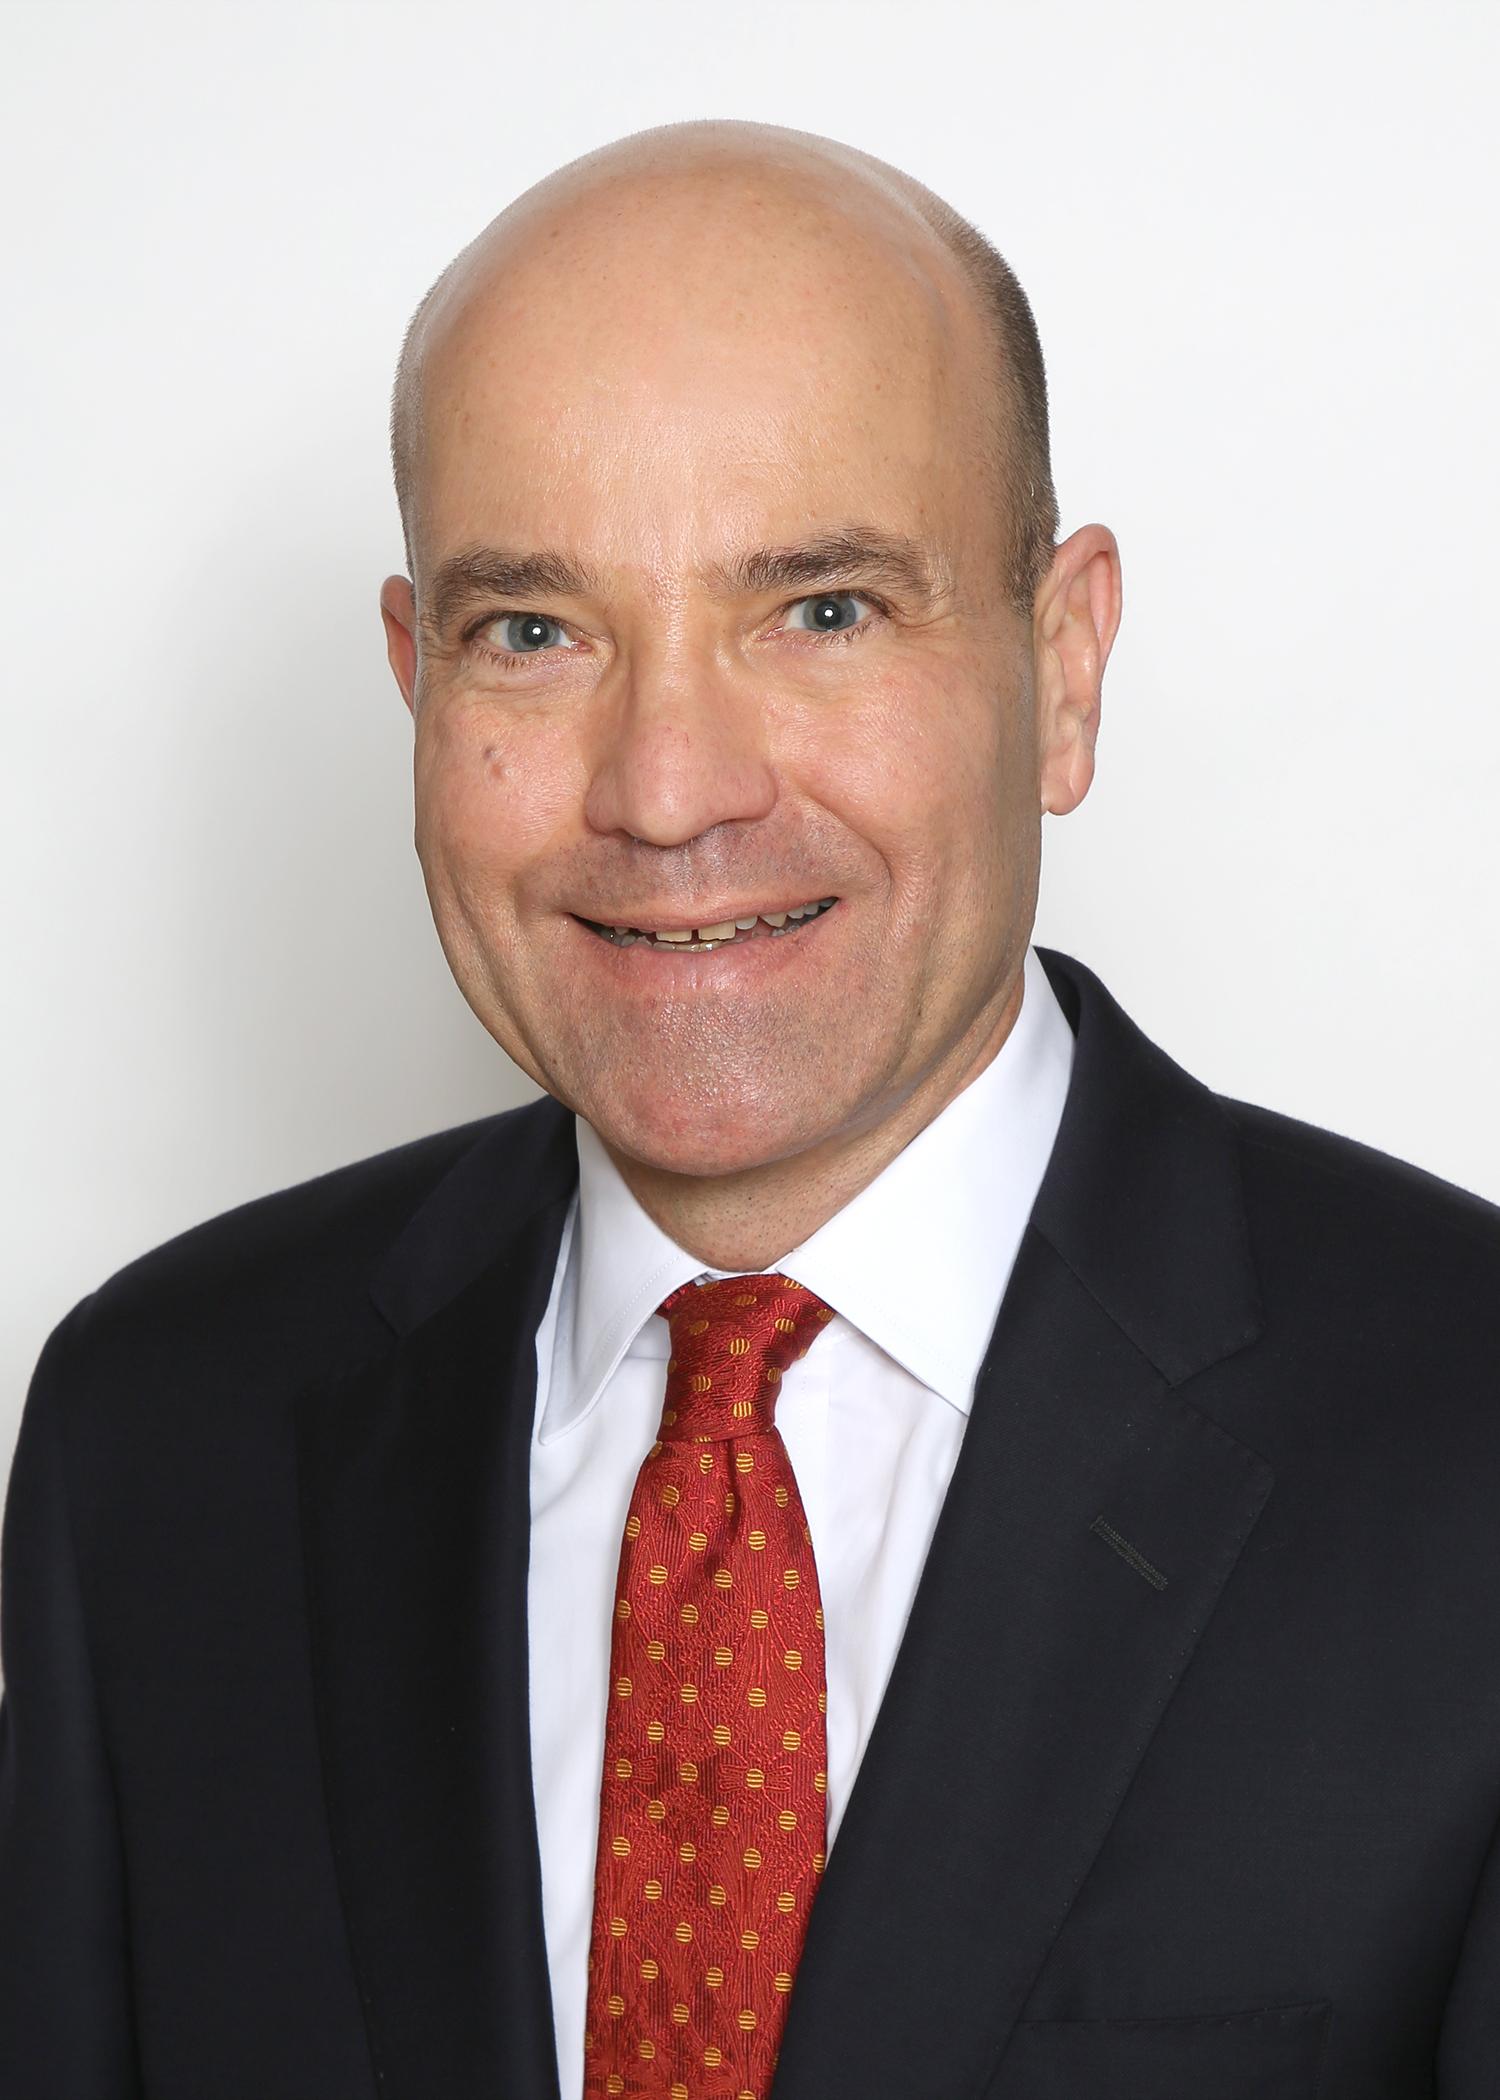 John Bober  Managing Member, IXL Lease Advisory Services